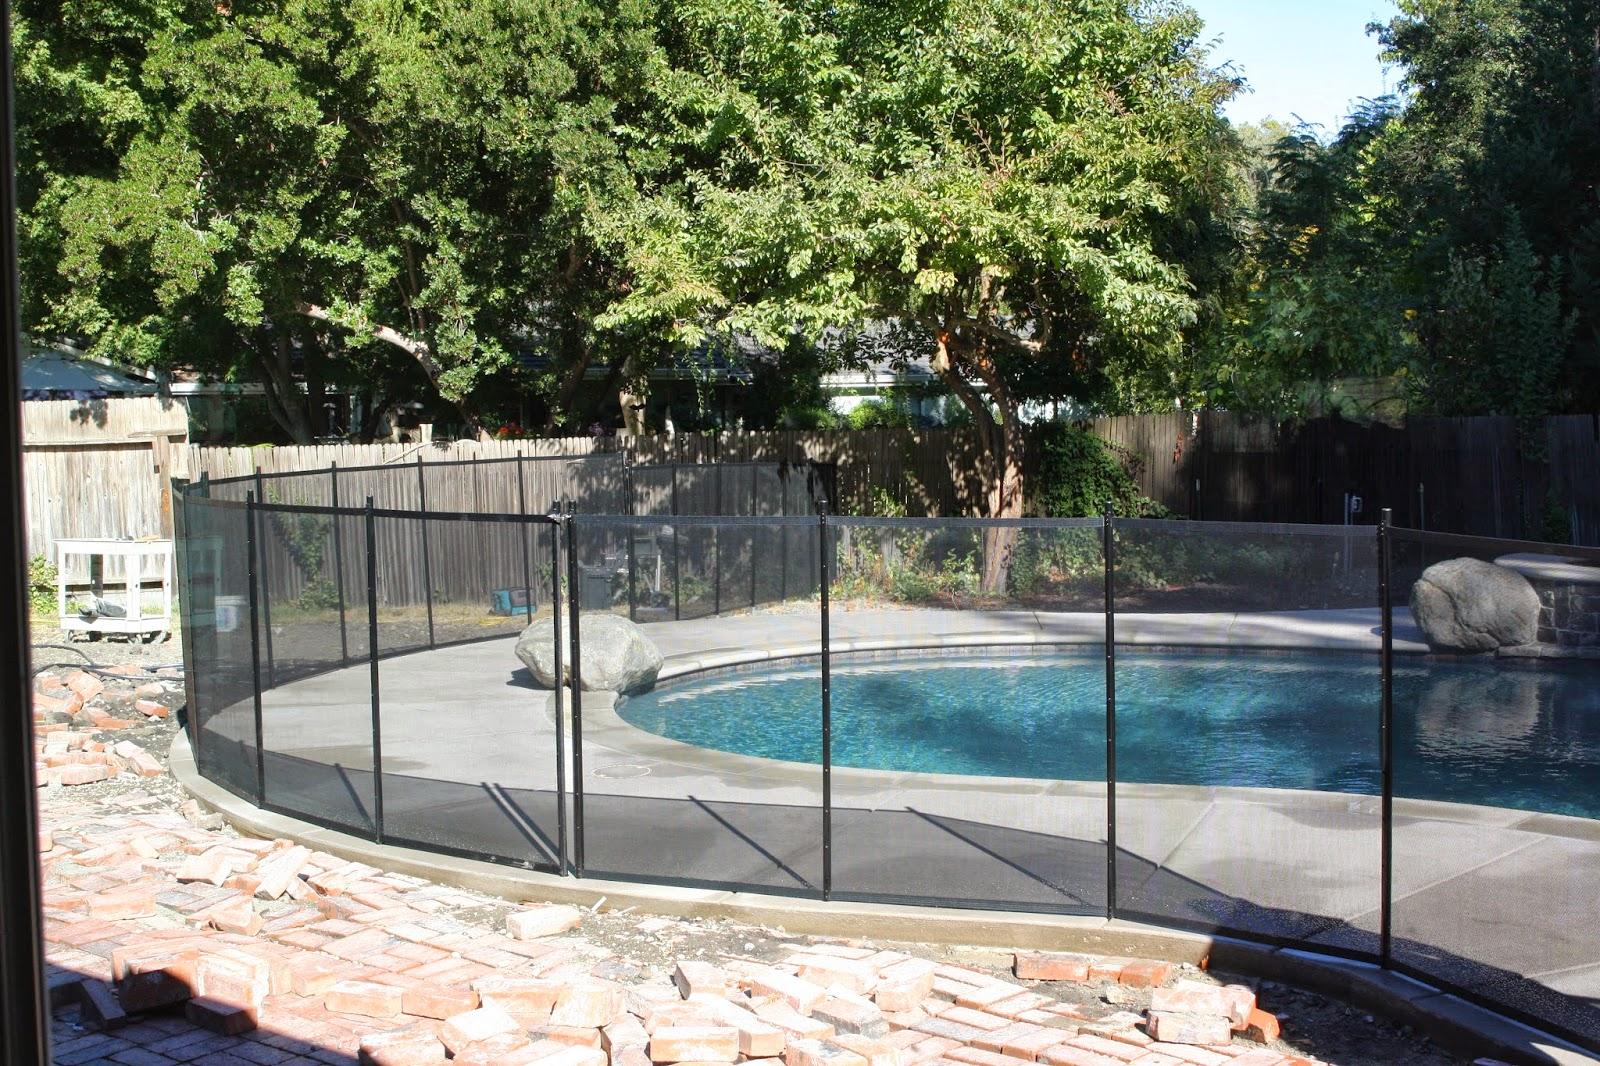 backyard update pool fence u0026 brick patio completed simply organized